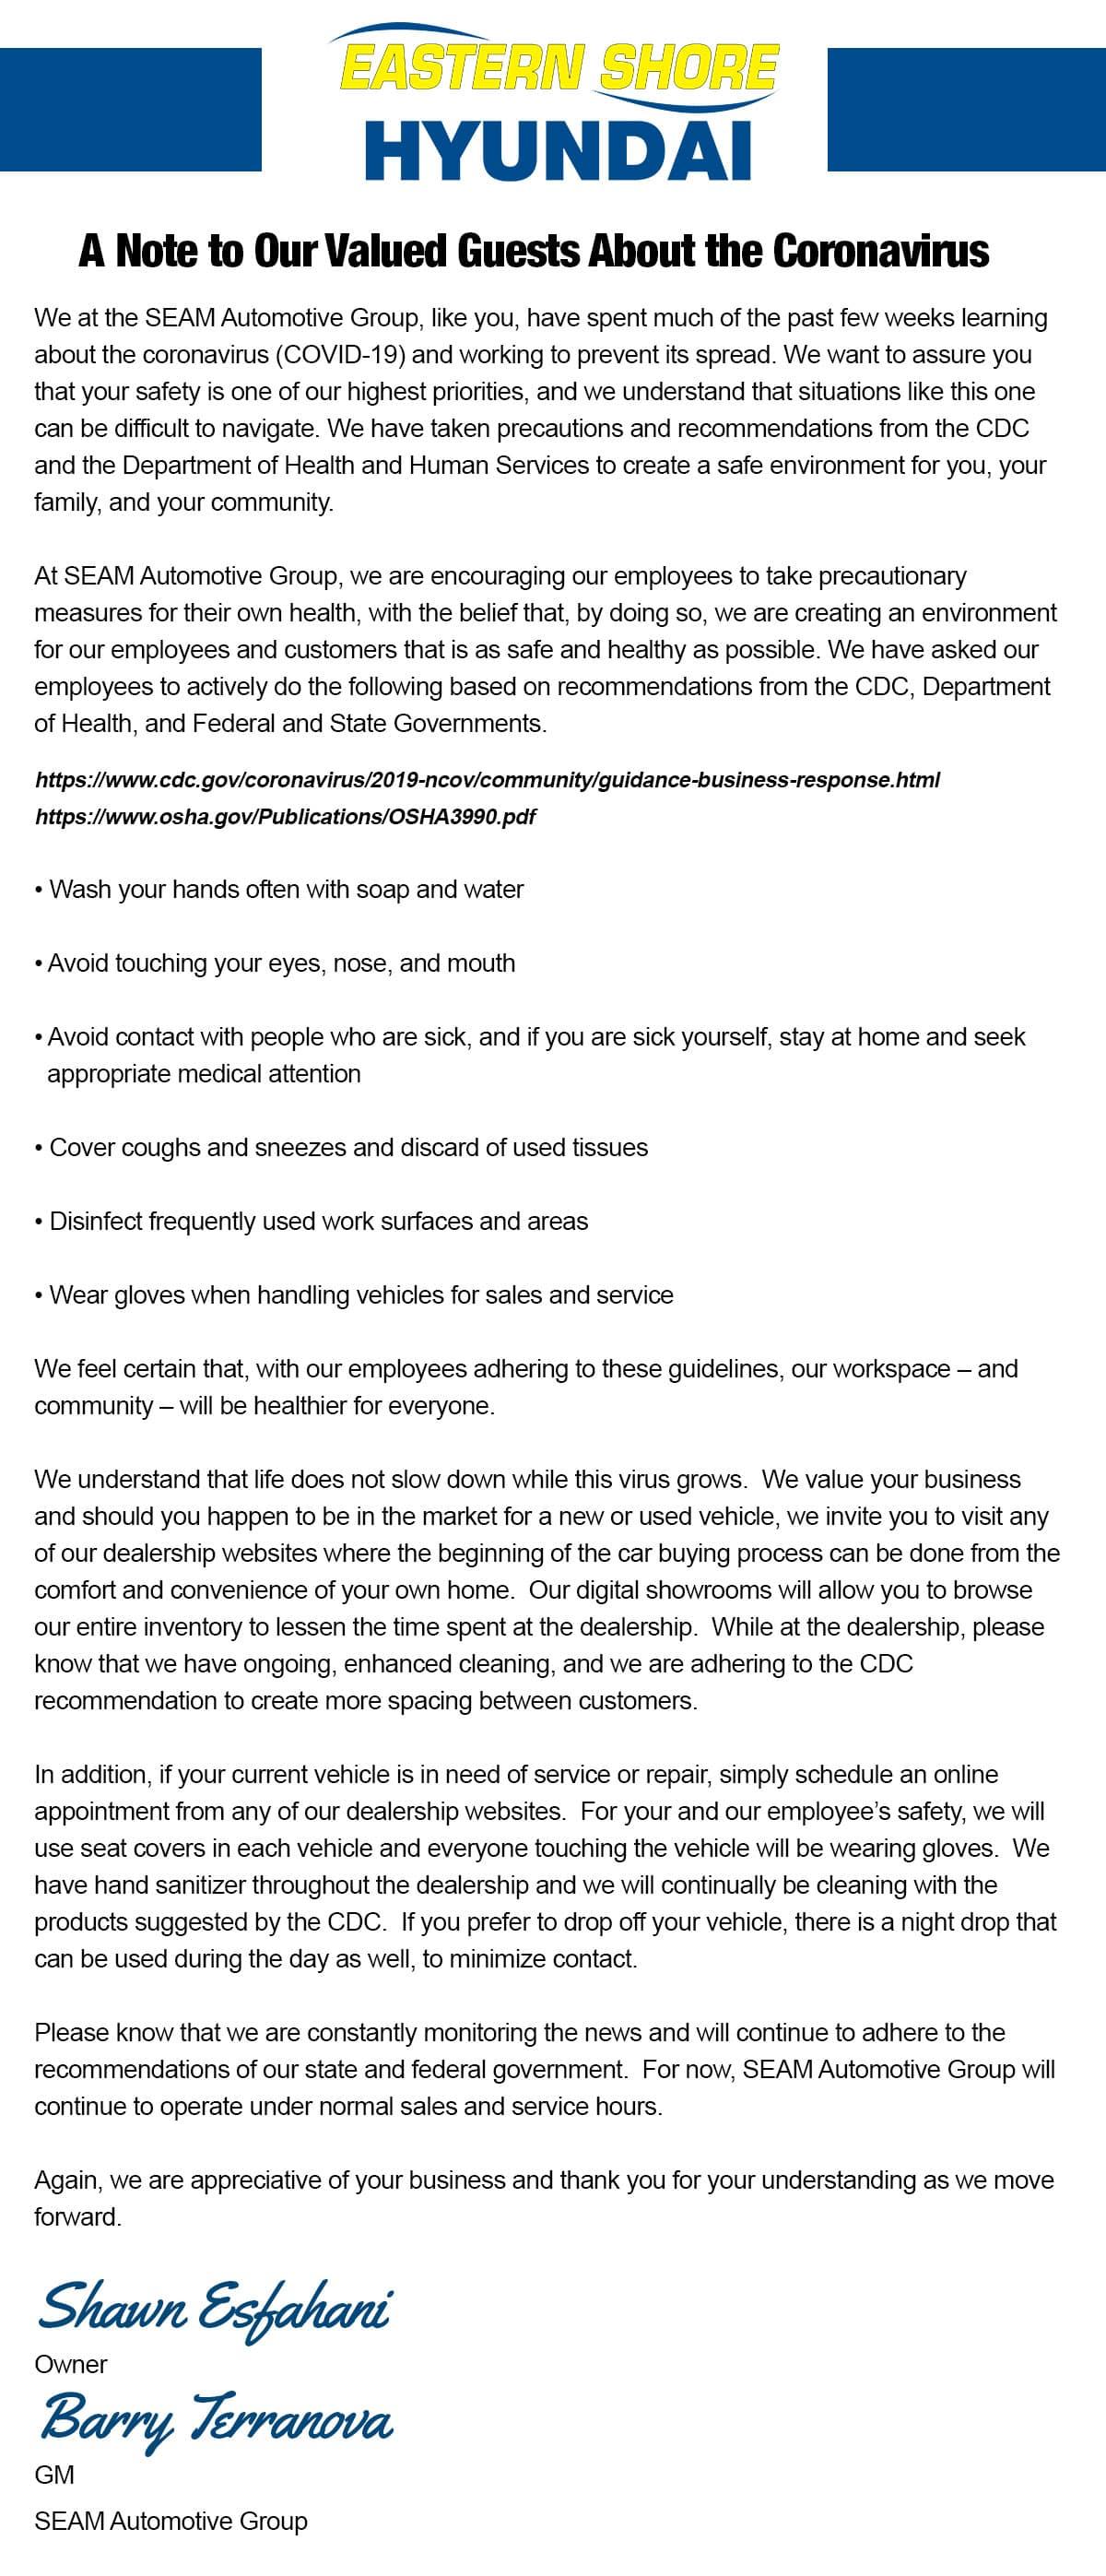 COVID-19 Press Release at Eastern Shore Hyundai